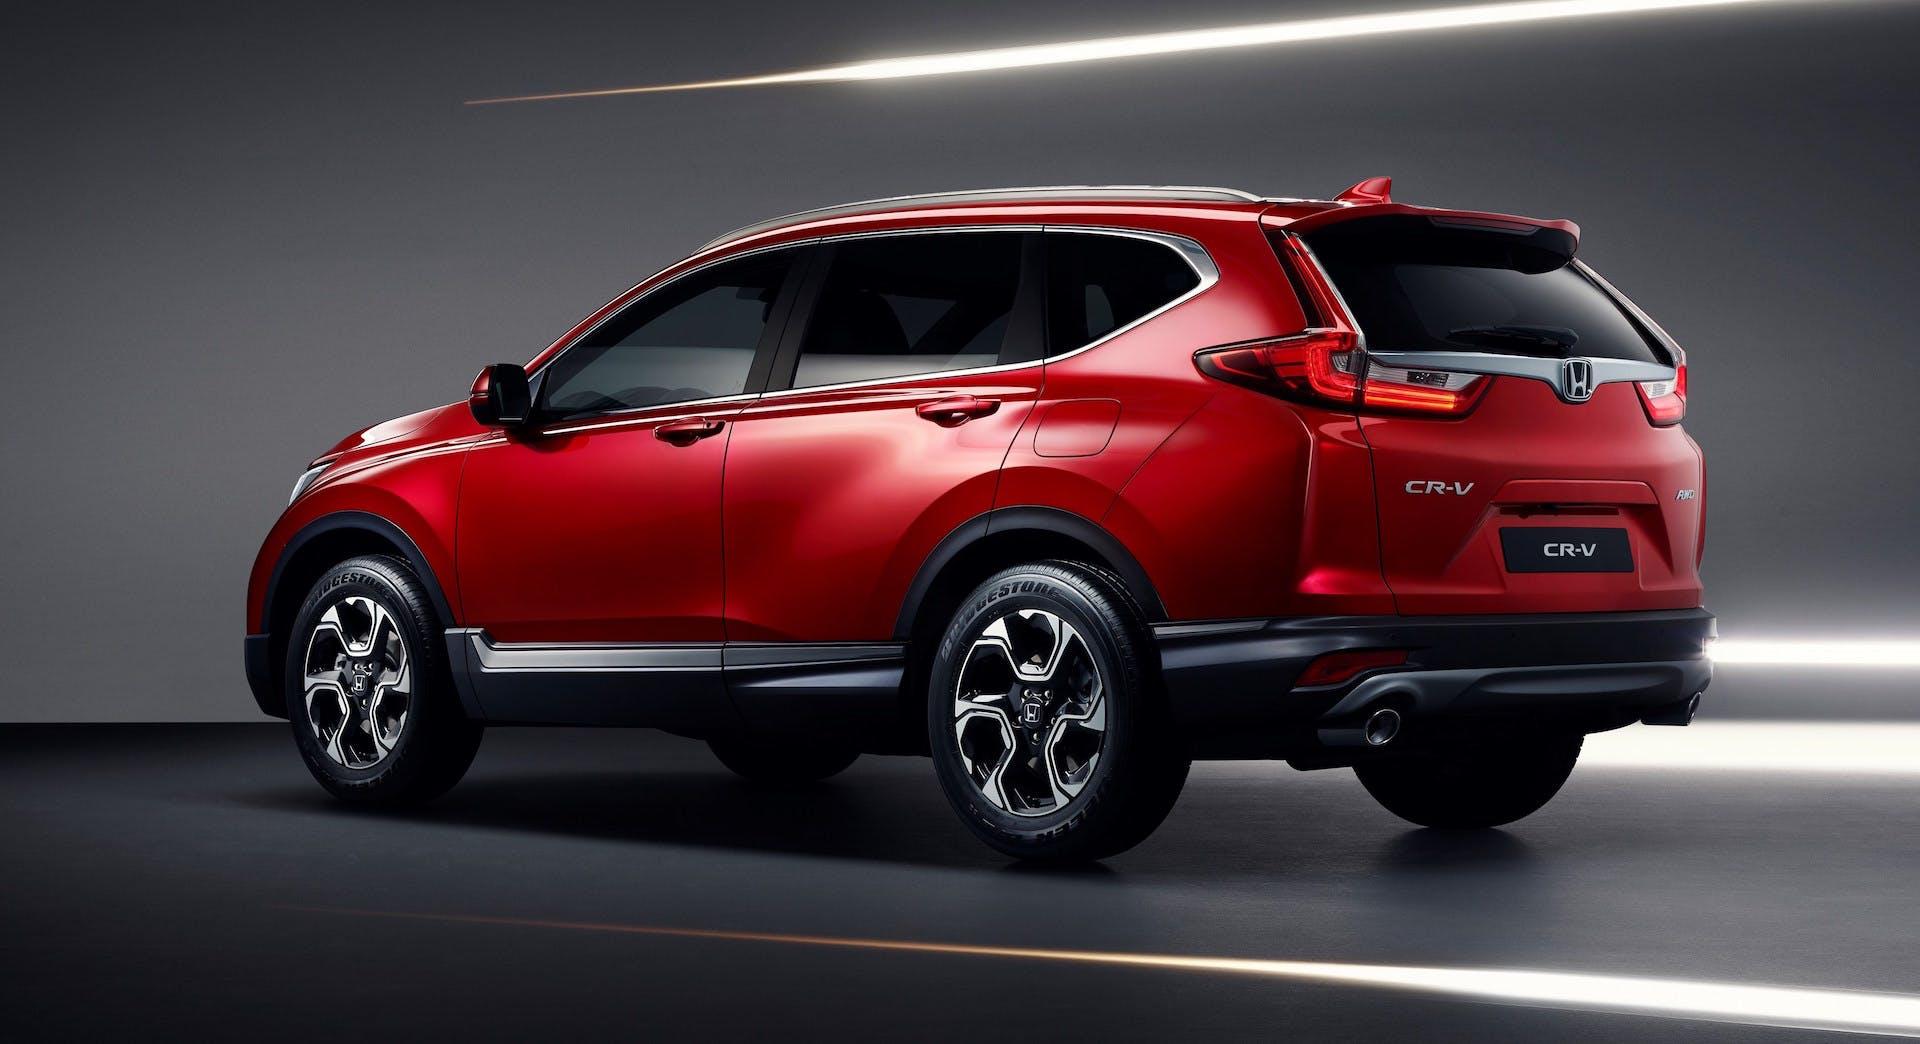 Honda CR-V rosso laterale statica